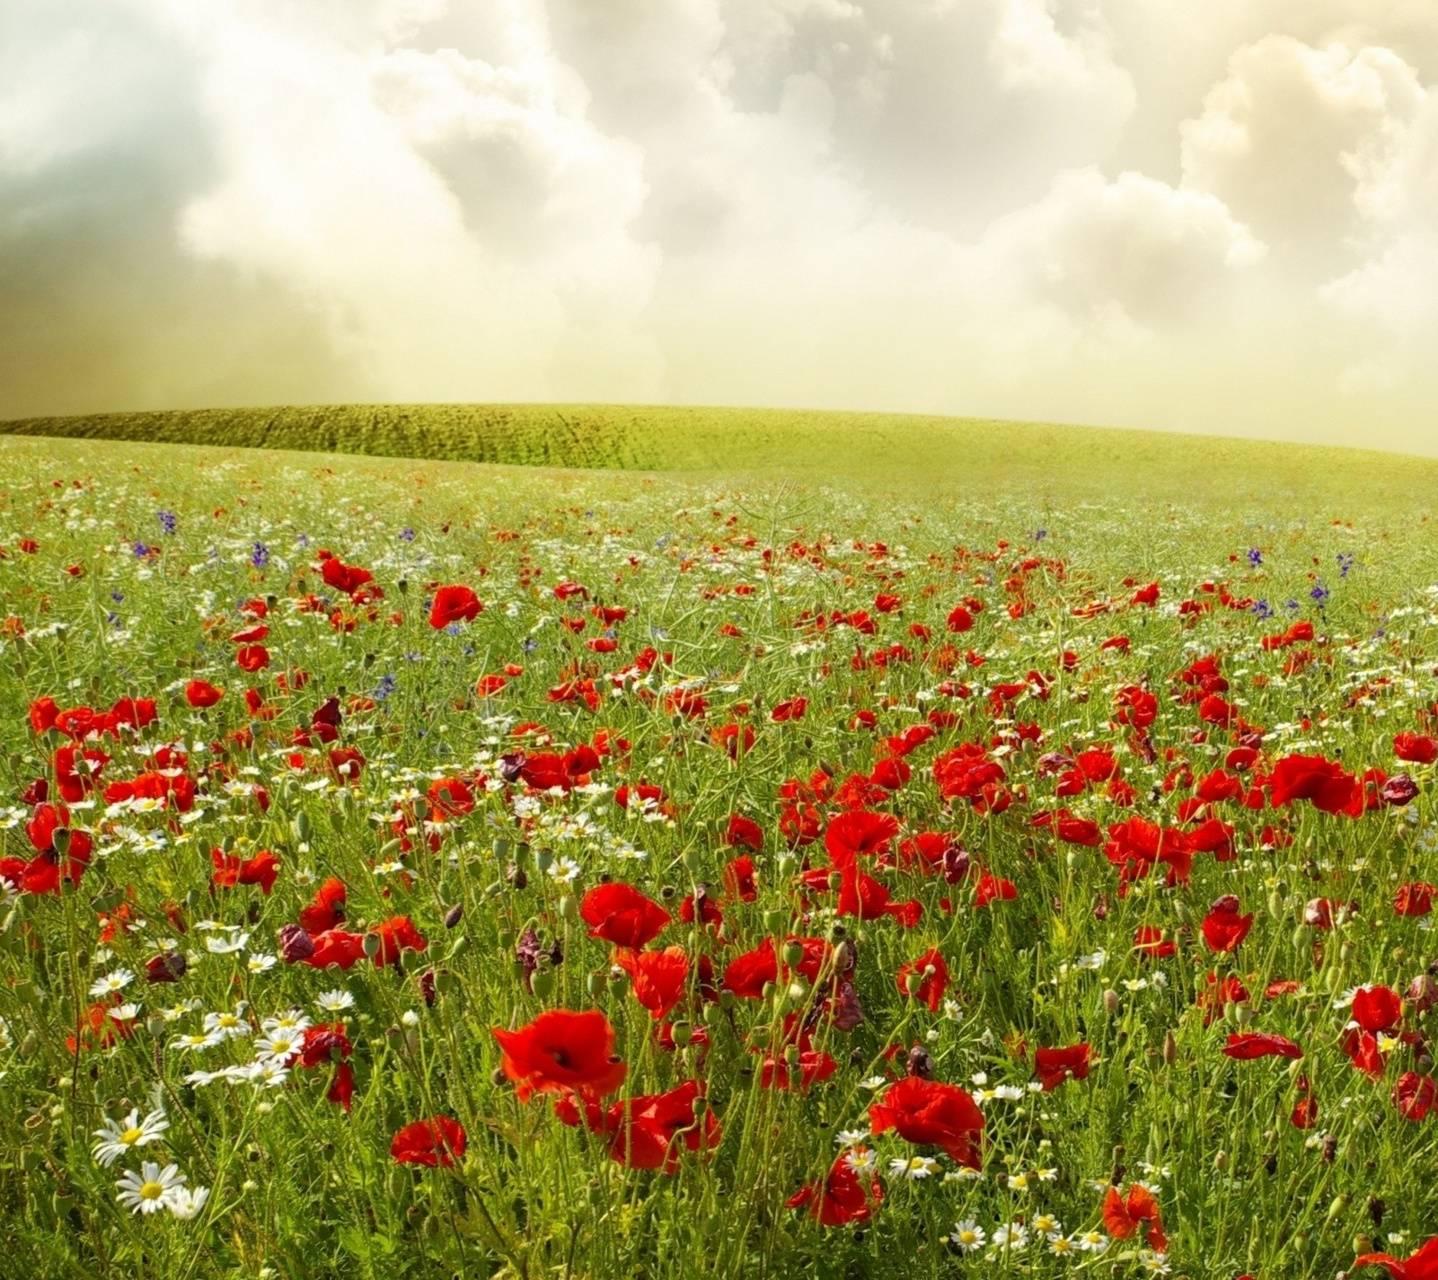 Beautifu poppy field